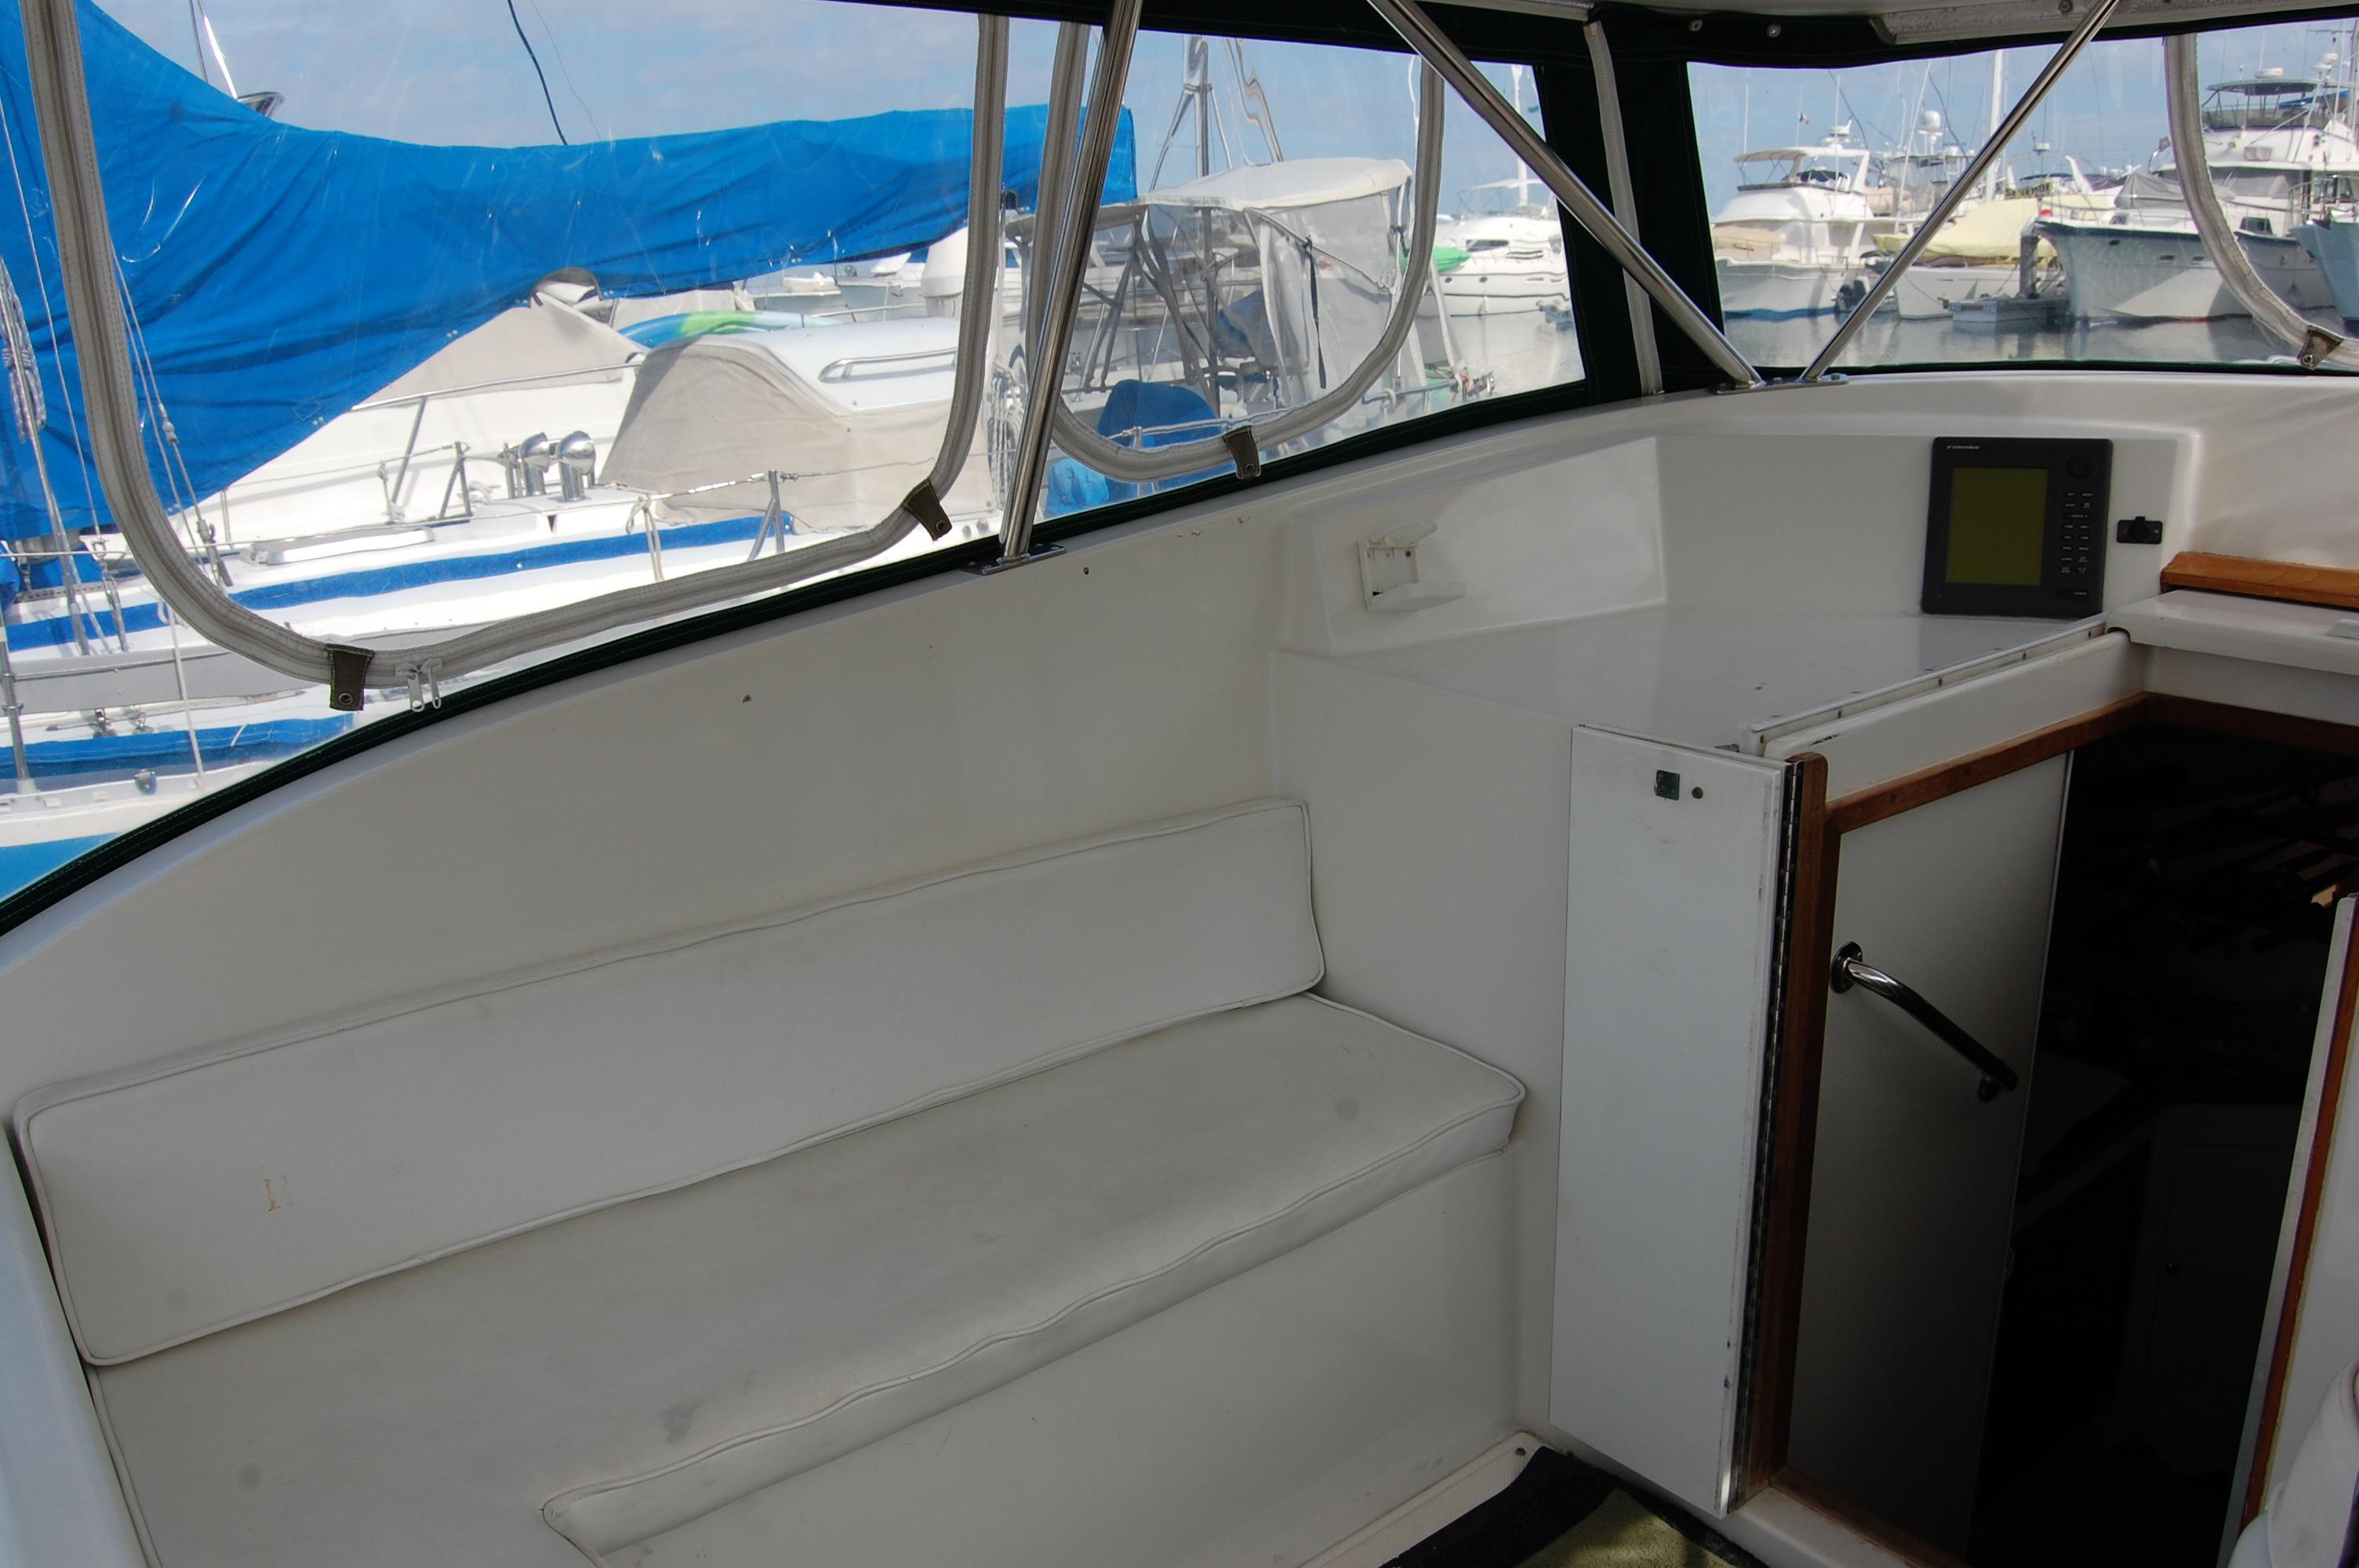 33' Knight & Carver Sportfisher+Companionway